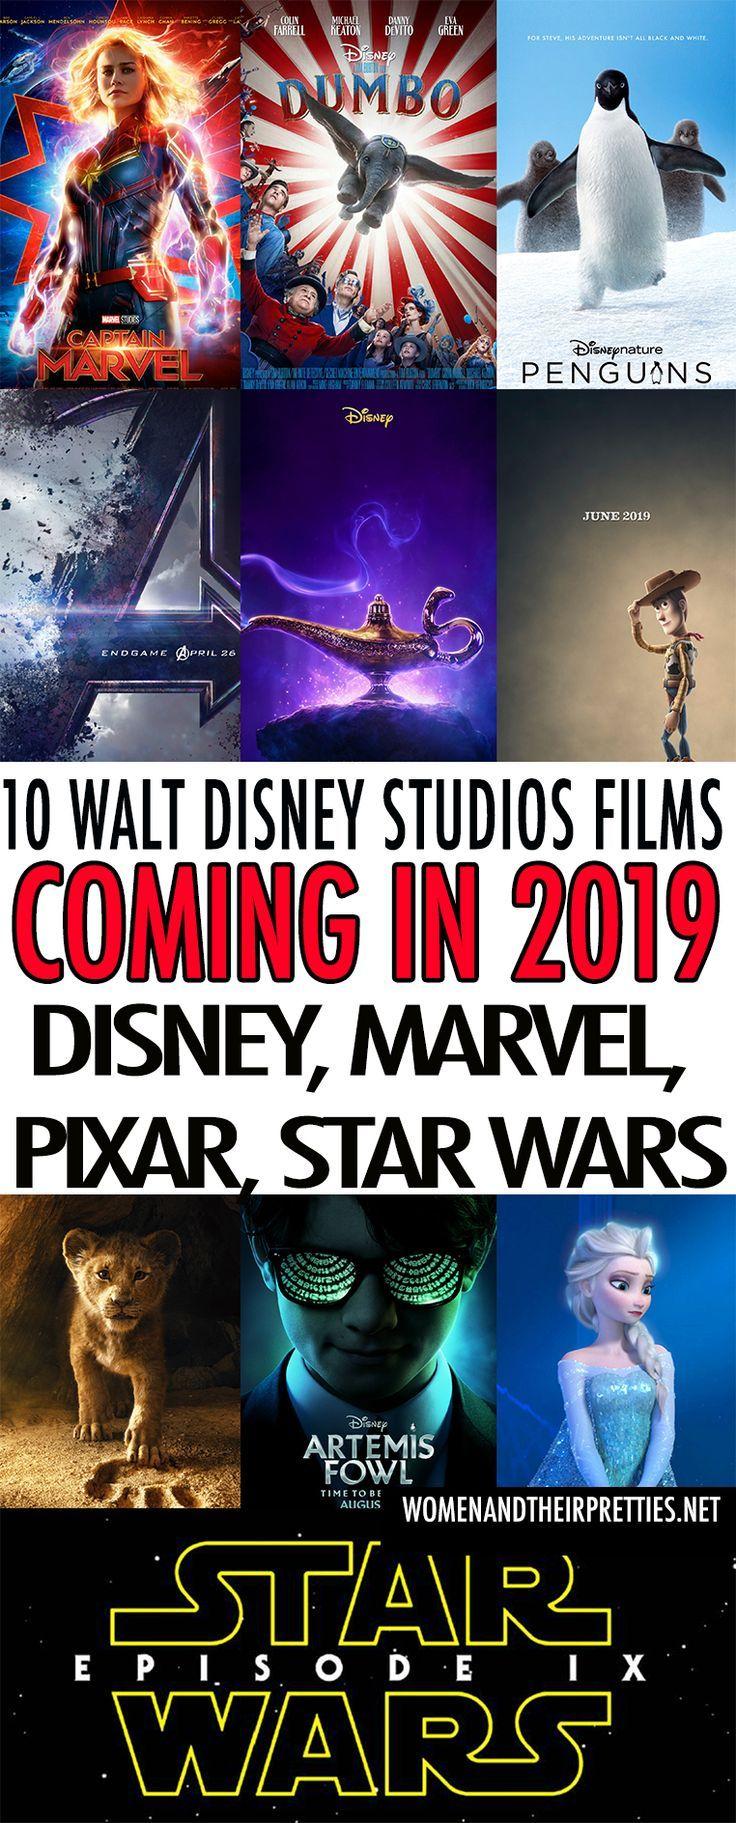 New Disney Marvel Pixar Star Wars Movies Coming In 2019 Star Wars Movie Pixar Movies Walt Disney Studios